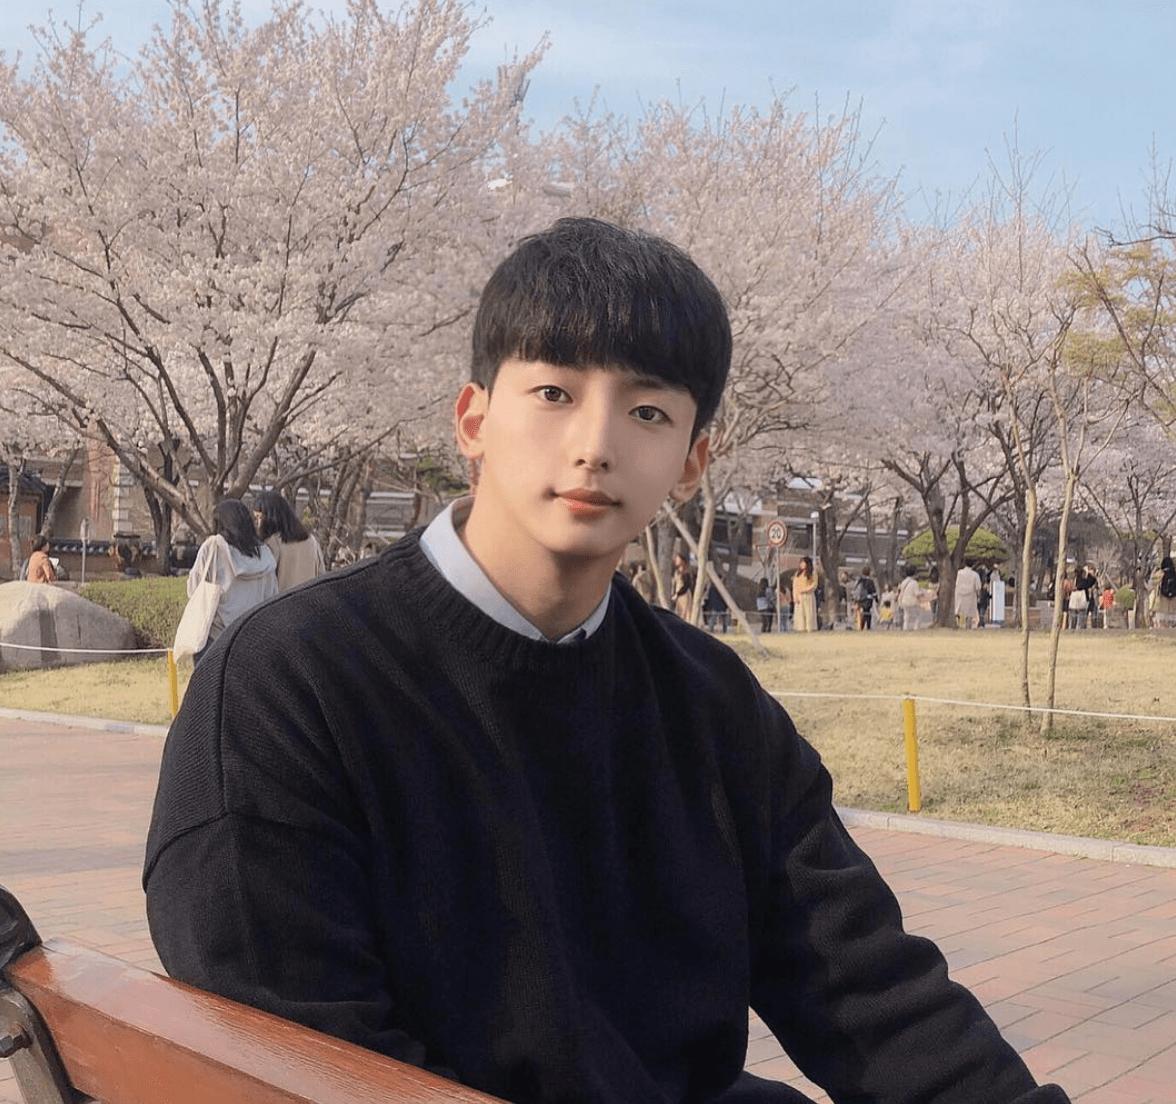 korean-social-media-influencer-instagram-model-yeojun_4.png